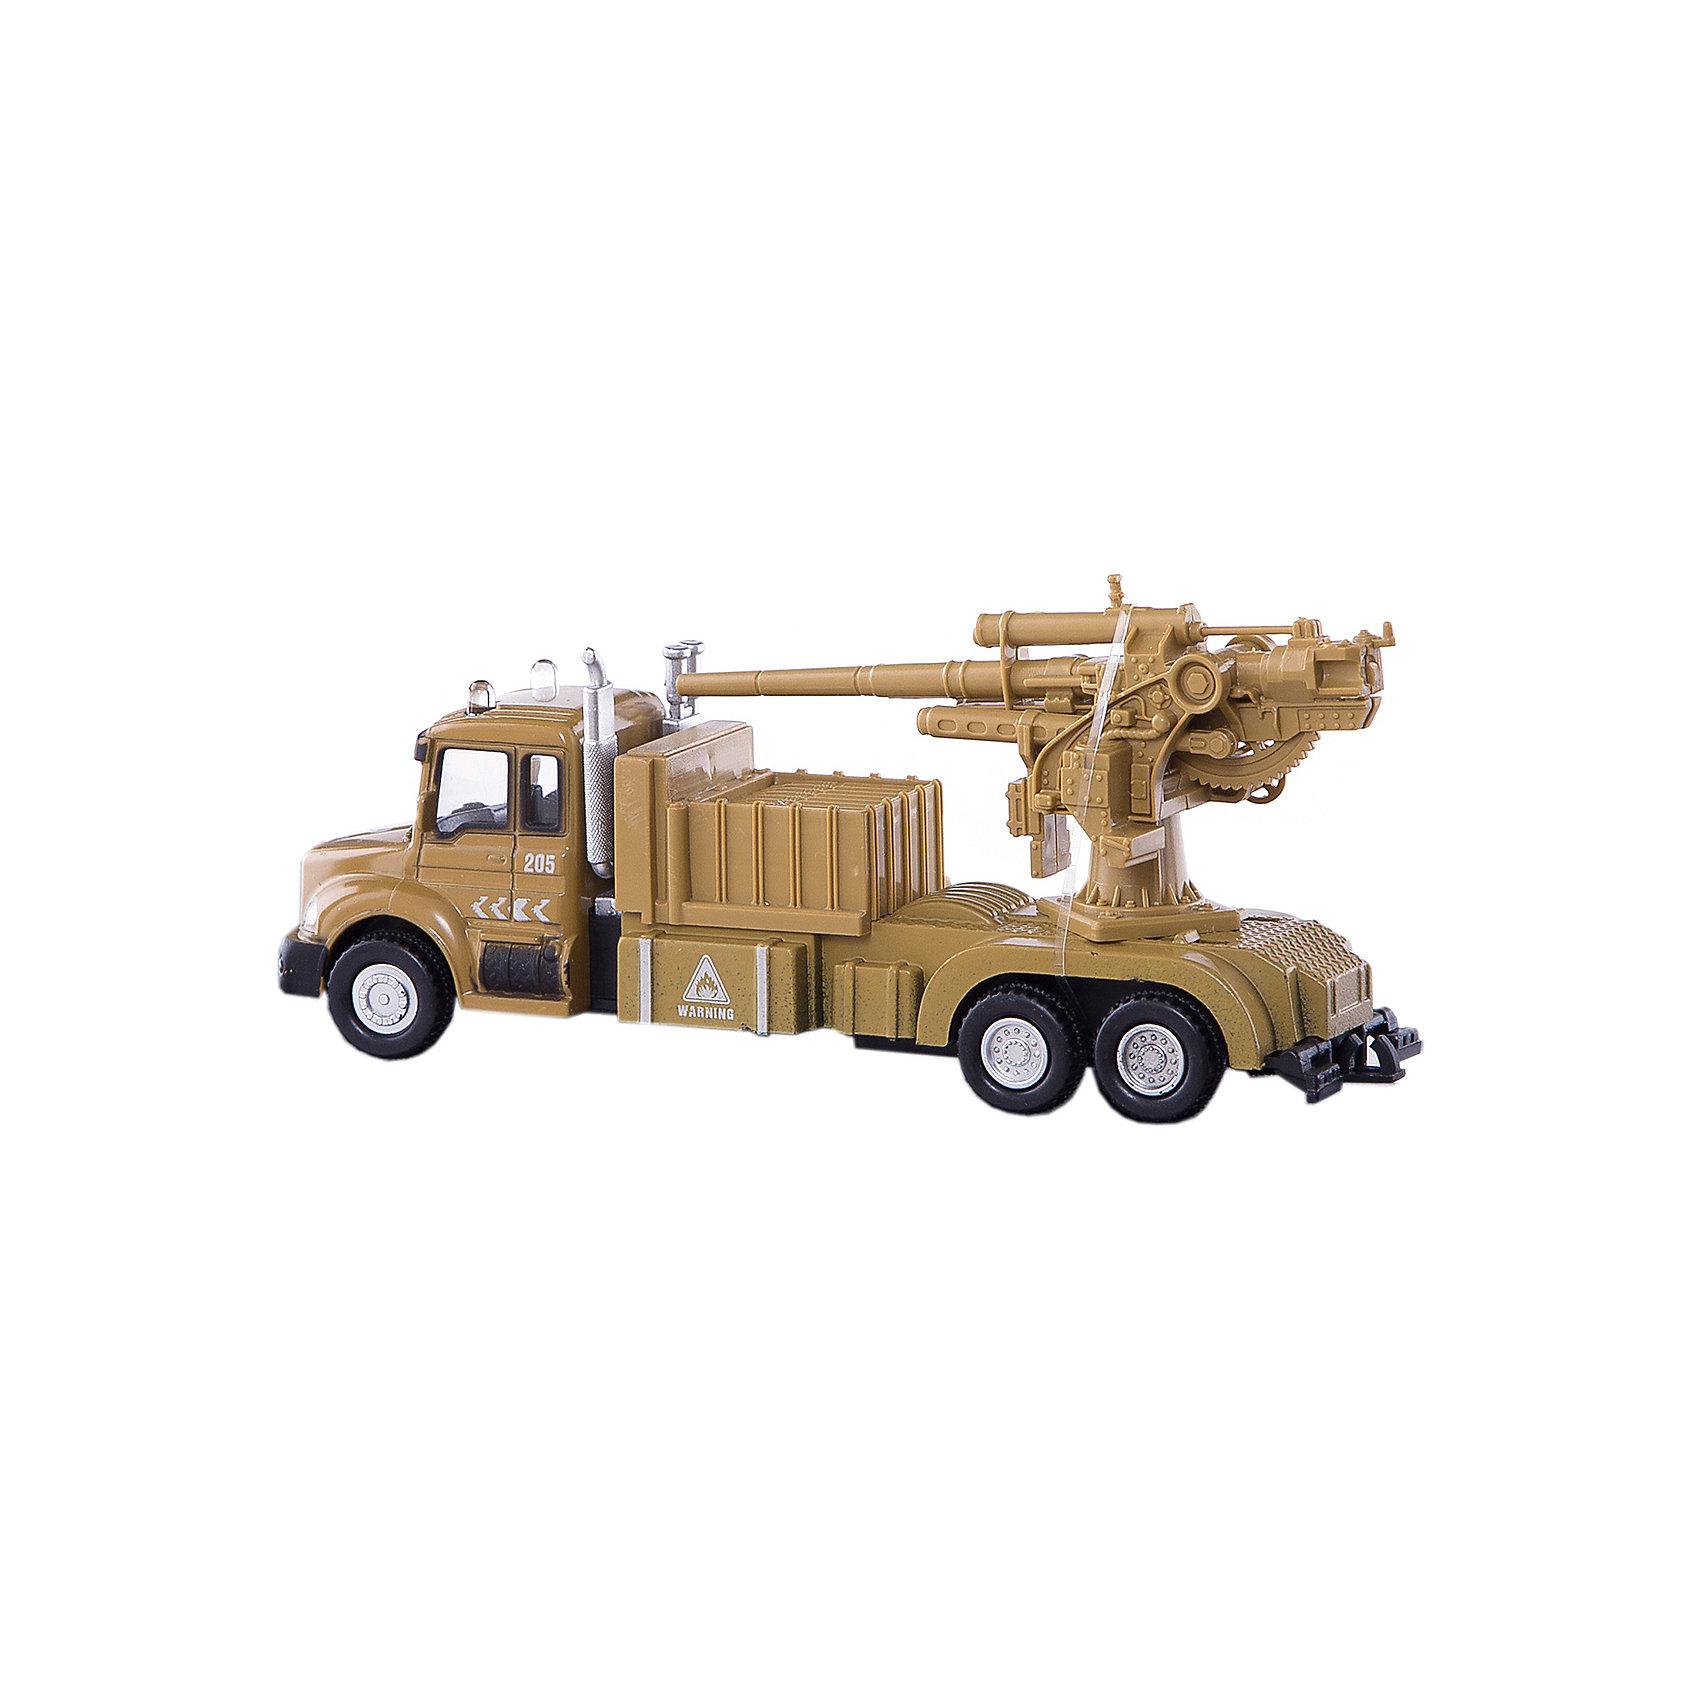 Машинка Military Gun Truck с орудием 1:48, AutotimeМашинки<br><br><br>Ширина мм: 165<br>Глубина мм: 57<br>Высота мм: 75<br>Вес г: 13<br>Возраст от месяцев: 36<br>Возраст до месяцев: 2147483647<br>Пол: Мужской<br>Возраст: Детский<br>SKU: 5584058